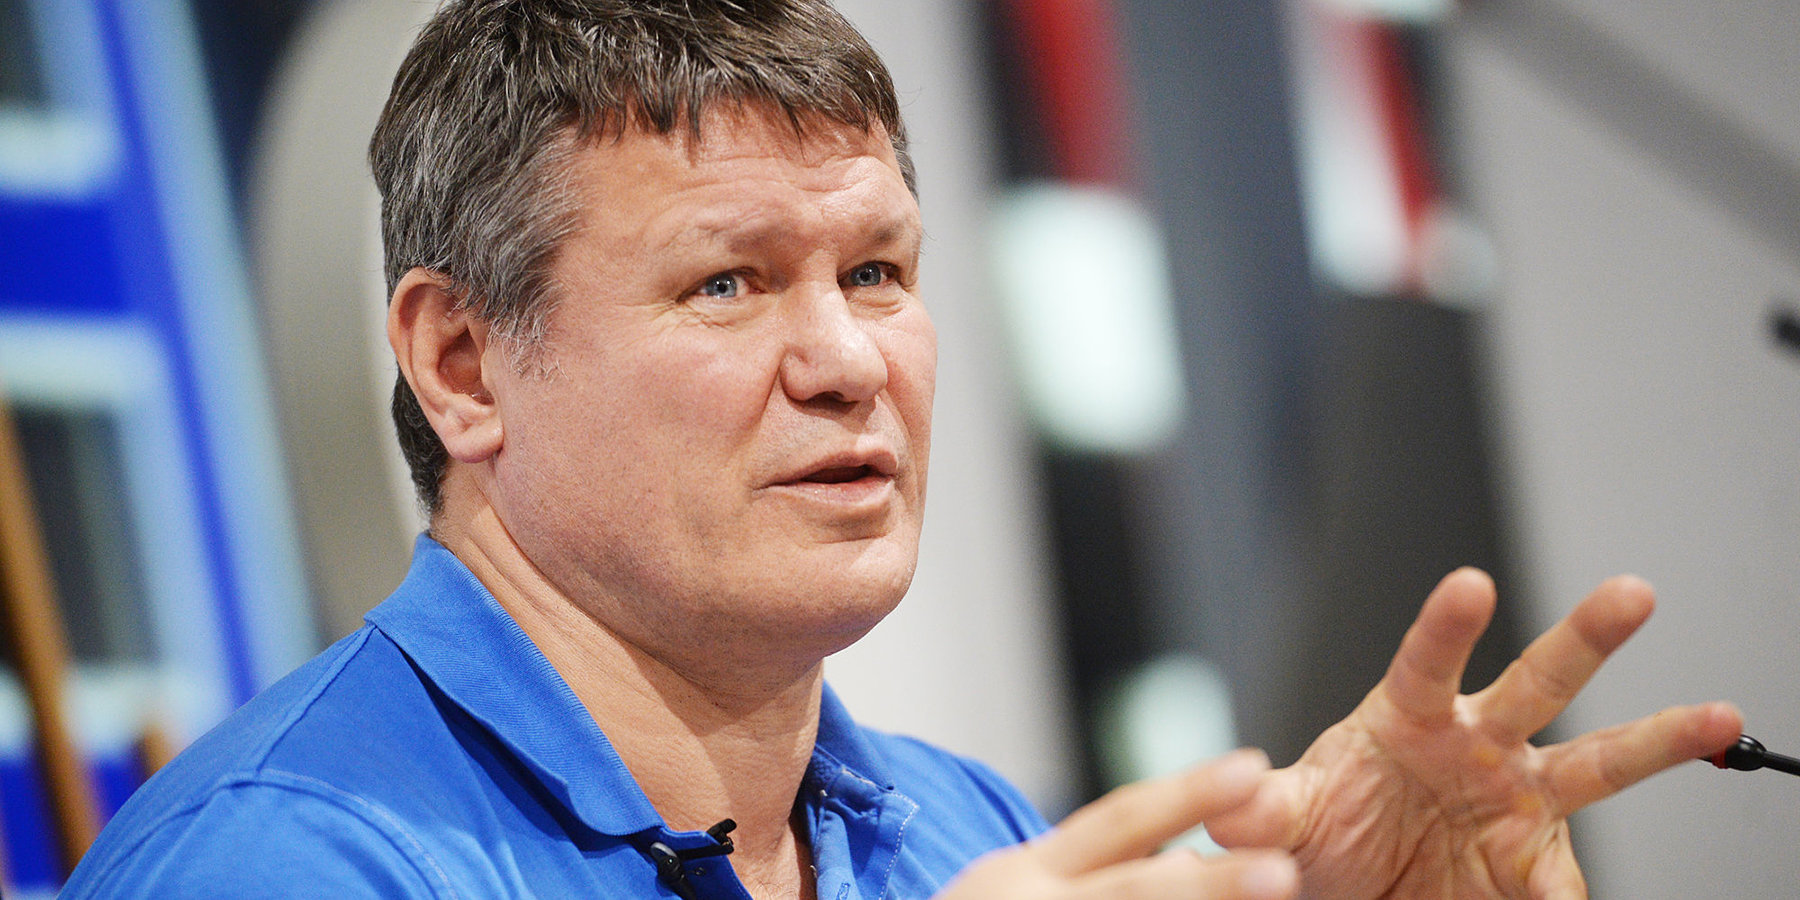 Олег Тактаров: «Яндиев больной на голову из-за COVID-19, правда на стороне Харитонова»